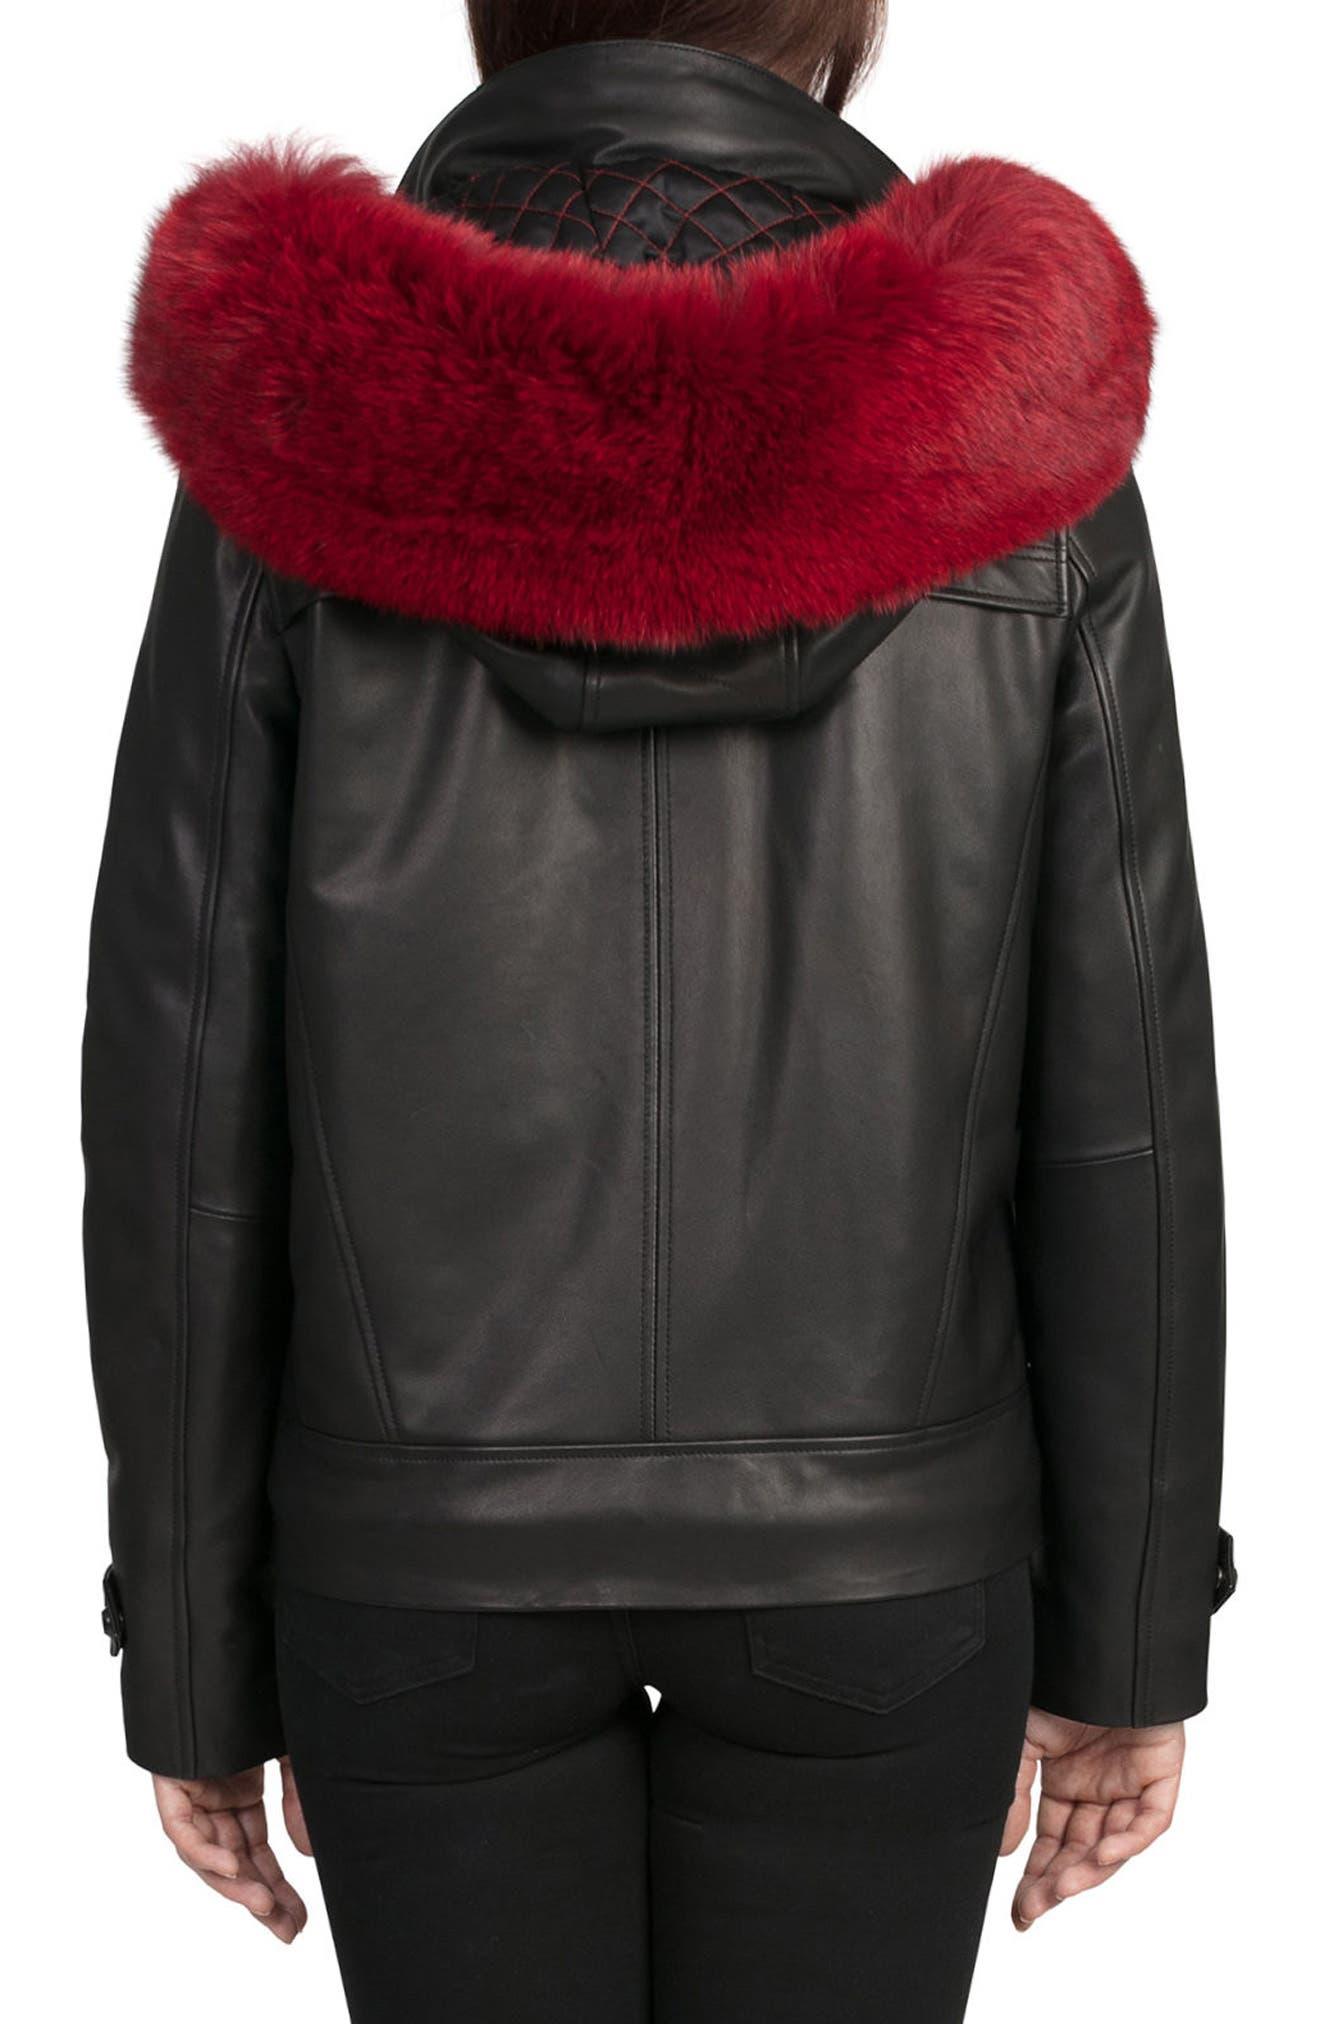 BAGATELLE.CITY The Aspen Leather Jacket with Genuine Fox Fur Trim,                             Alternate thumbnail 2, color,                             001